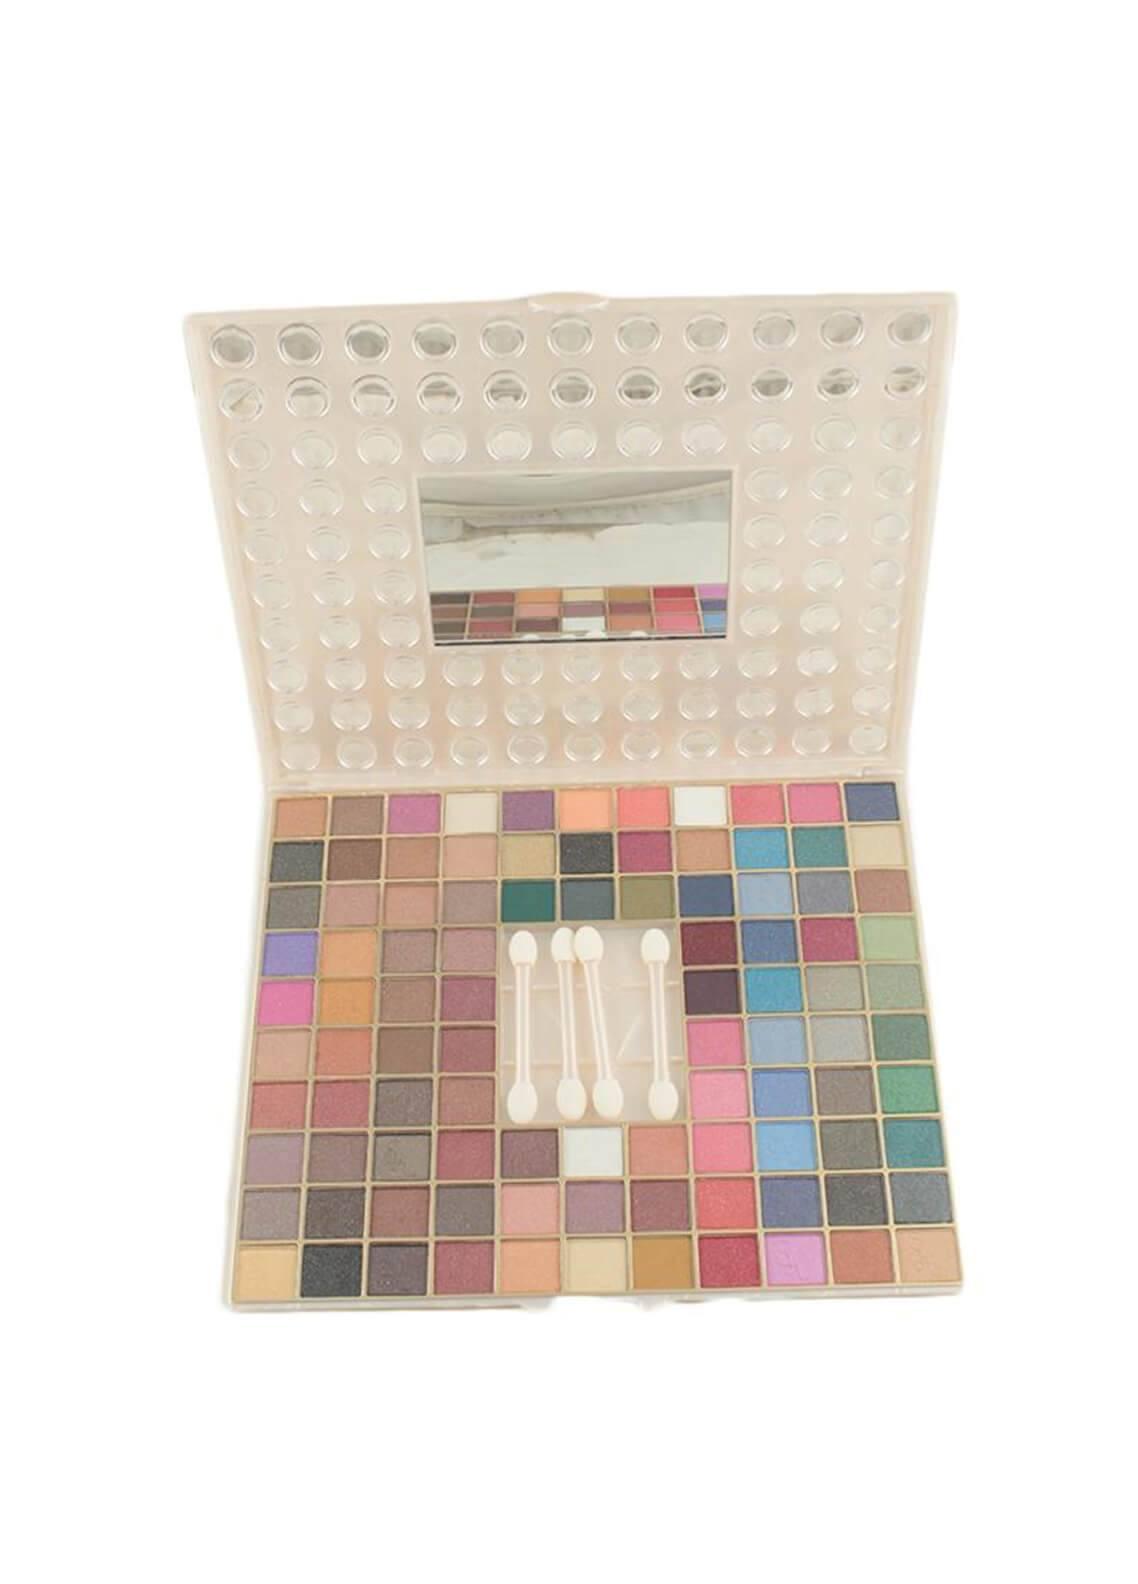 Sophia Asley Eye Shadow kit 98 Colors